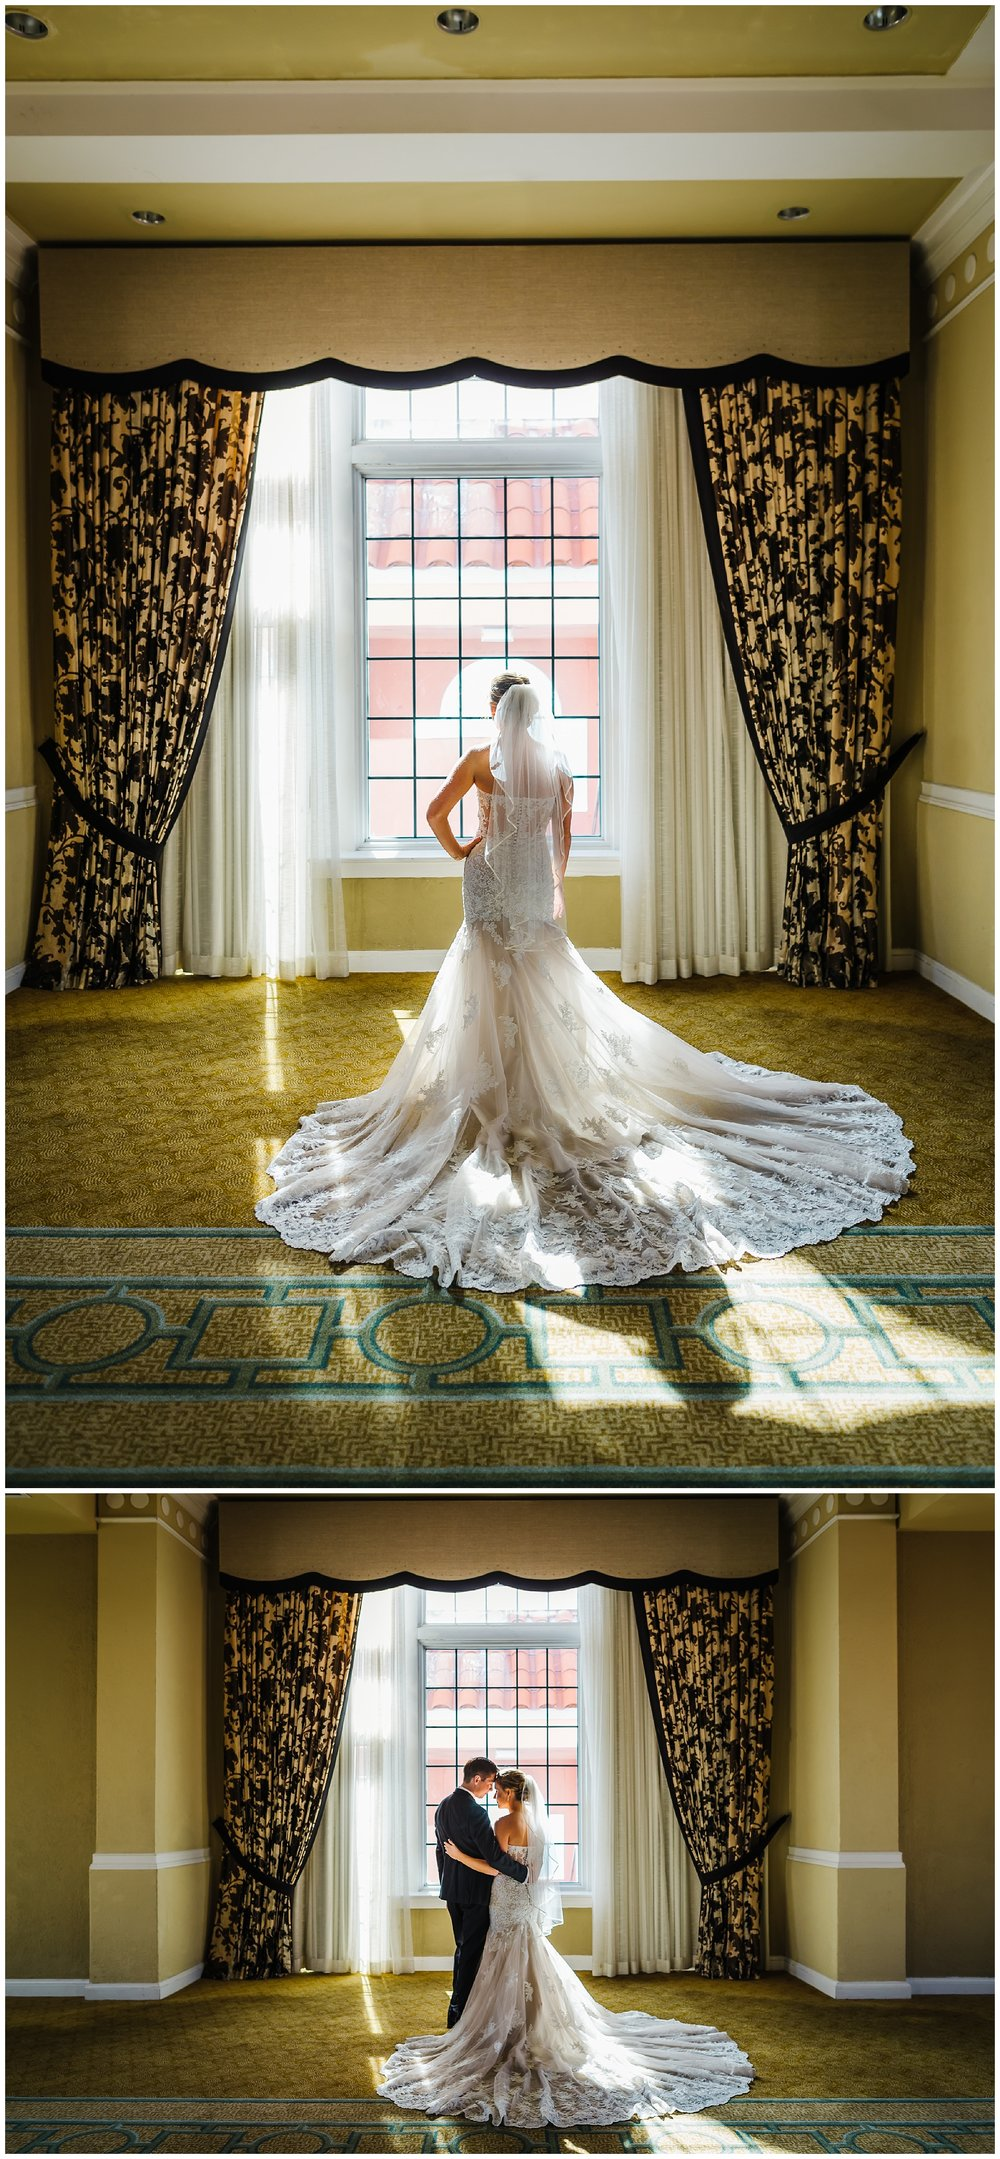 Tampa-wedding-photographer-bella-fleur-orchid-boquet-rsvb-events_0010.jpg